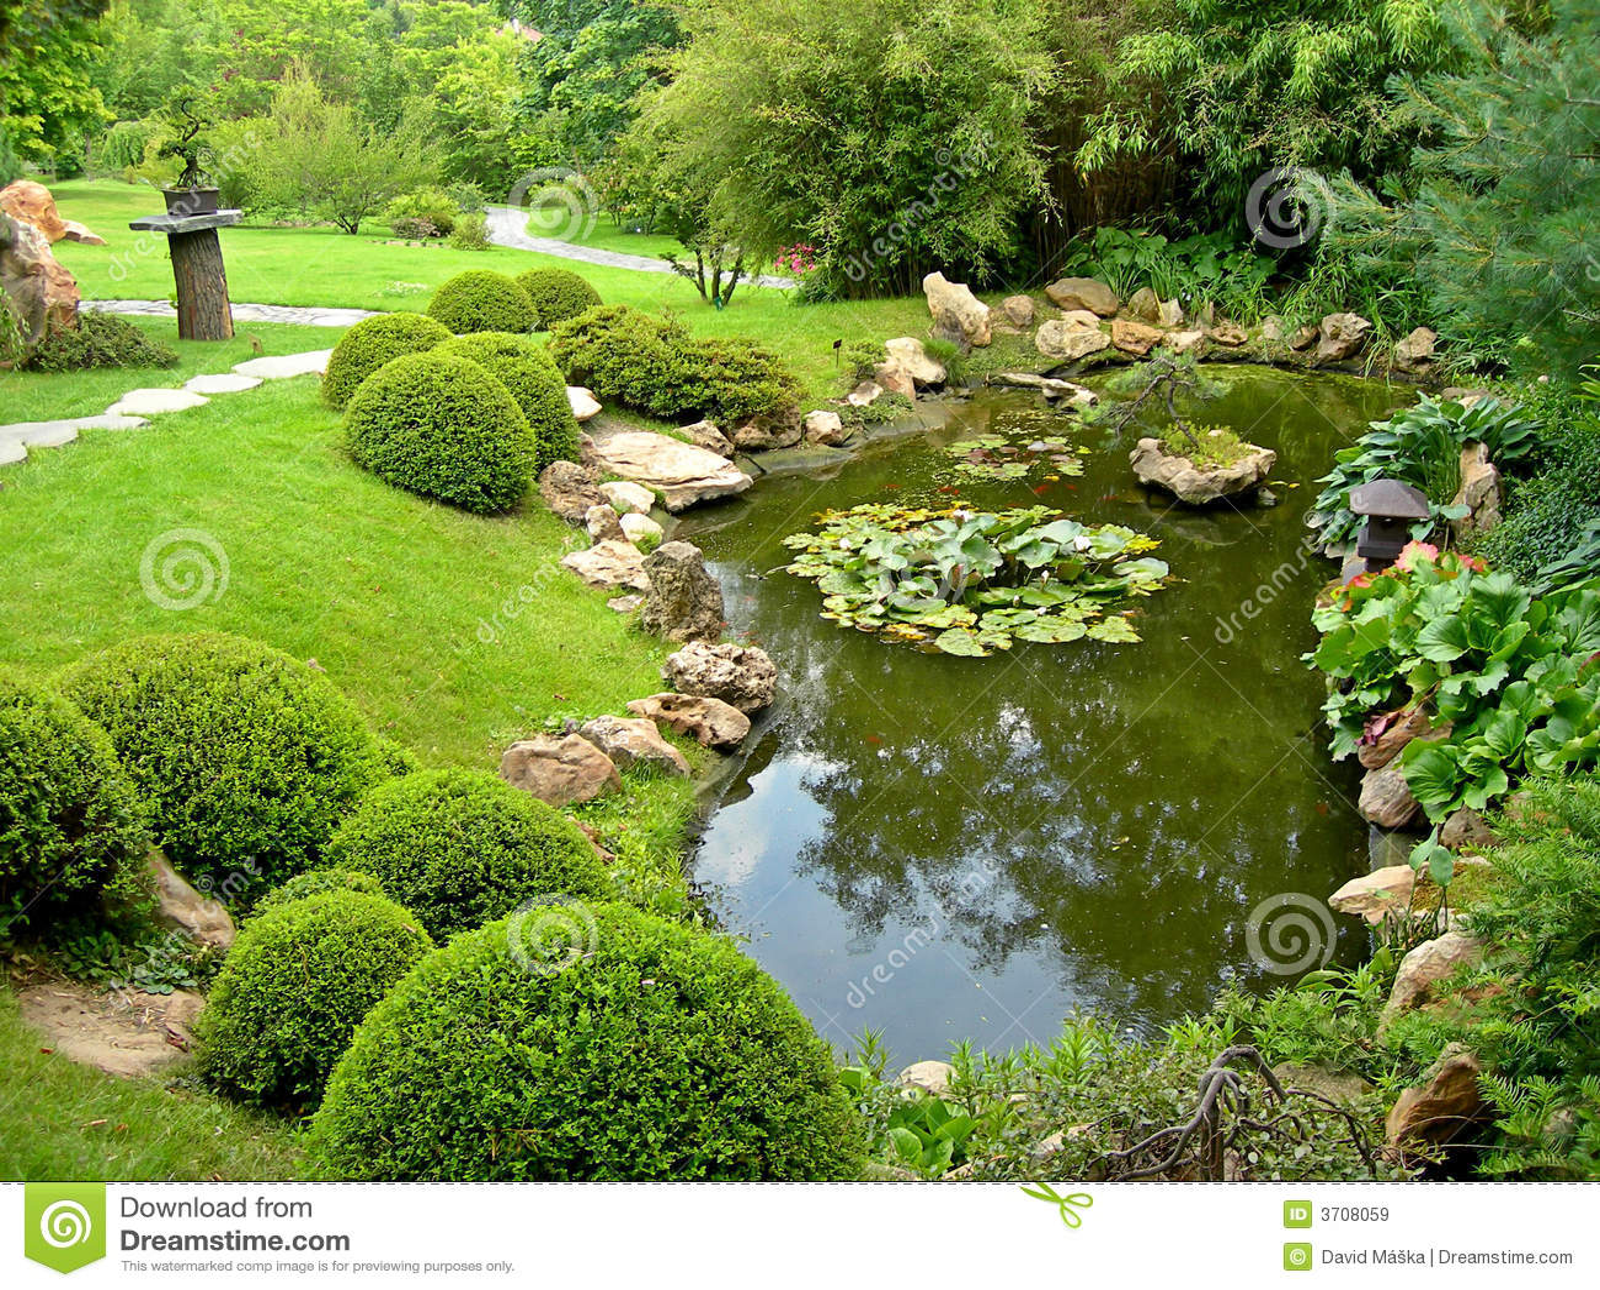 Japanse tuin en vijver stock afbeelding afbeelding for Tuin en vijver